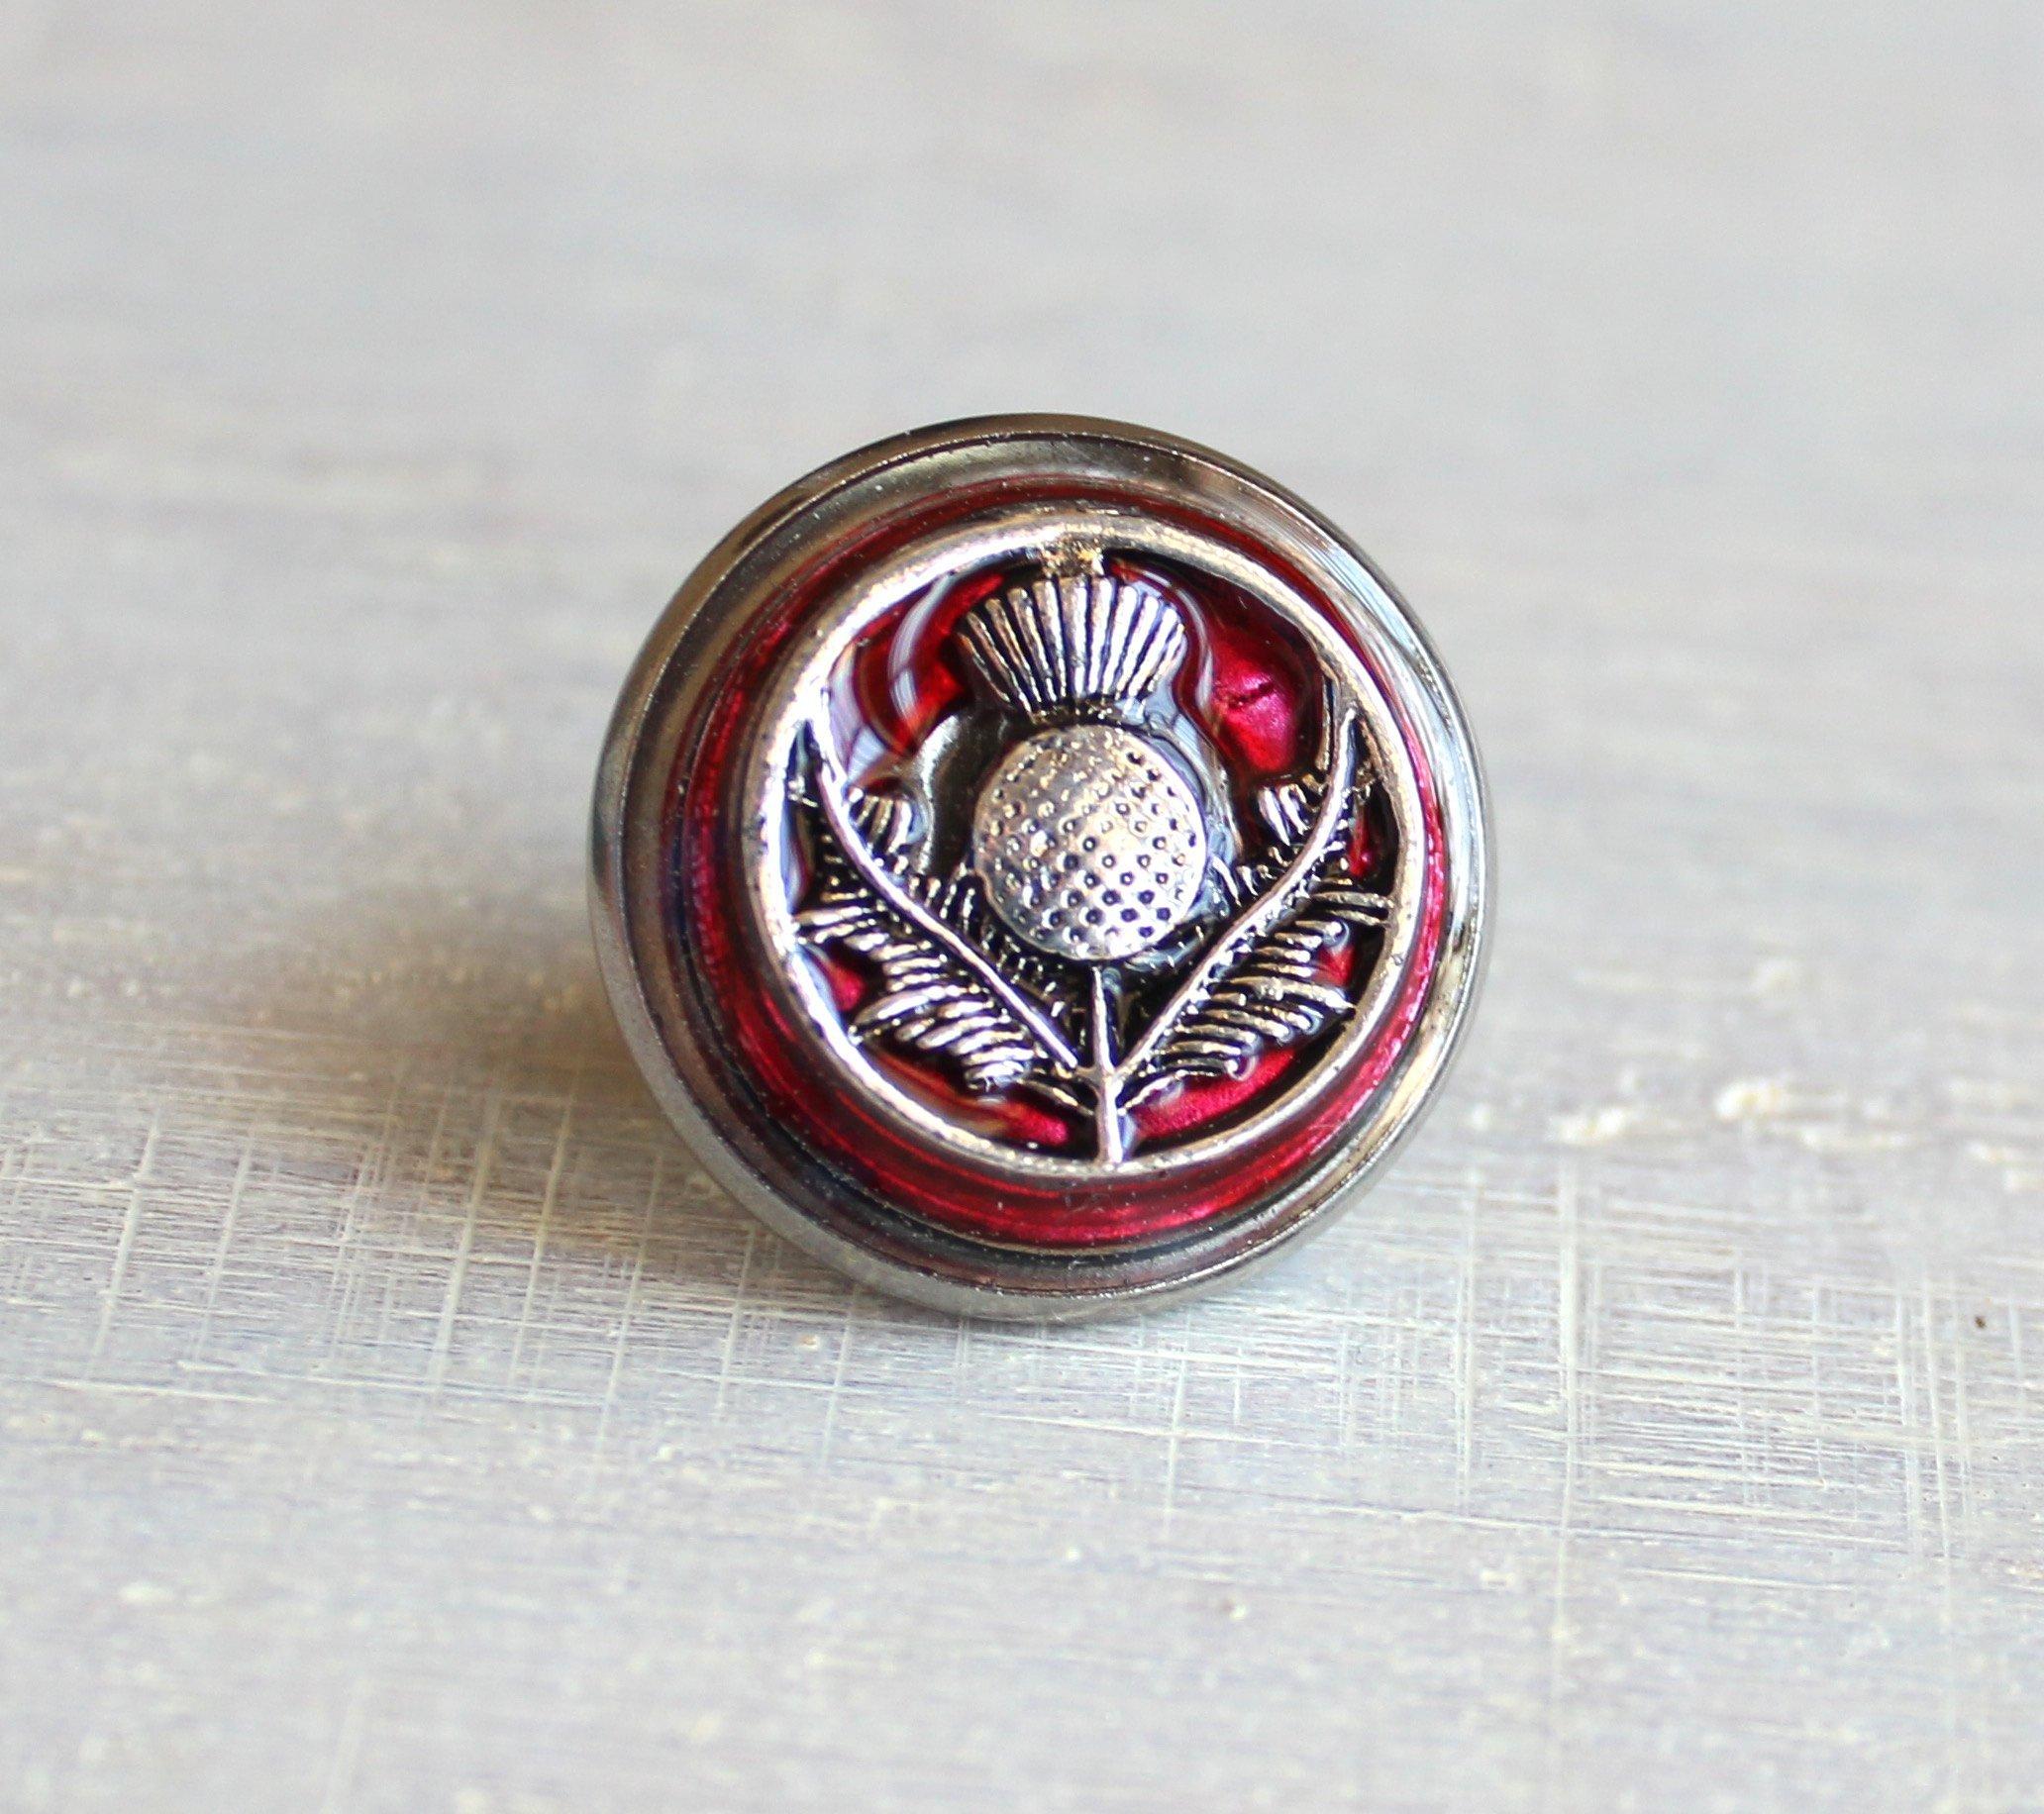 Red Scottish thistle tie tack / lapel pin.